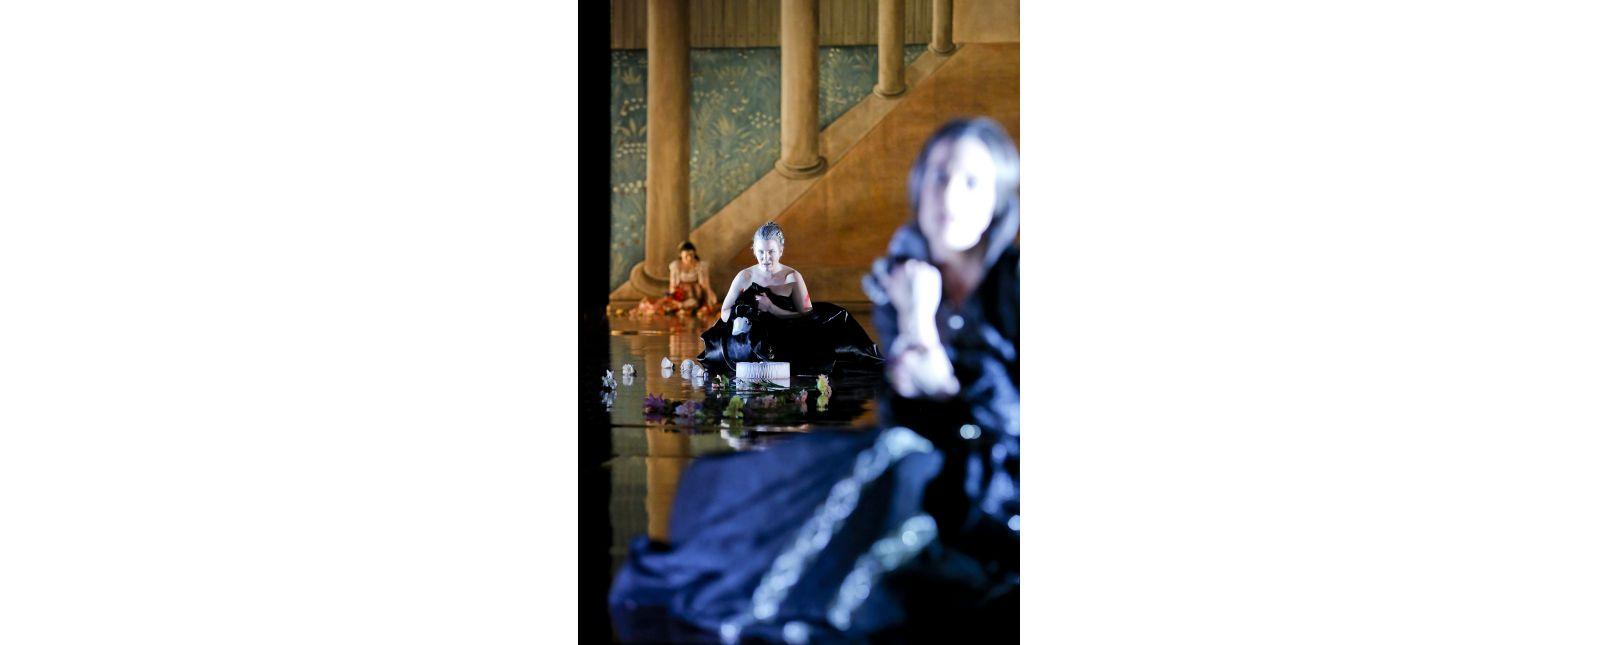 Die Bartholomäusnacht // Rosa Thormeyer // Janna Horstmann // Anja Schweitzer // 2019 // Birgit Hupfeld